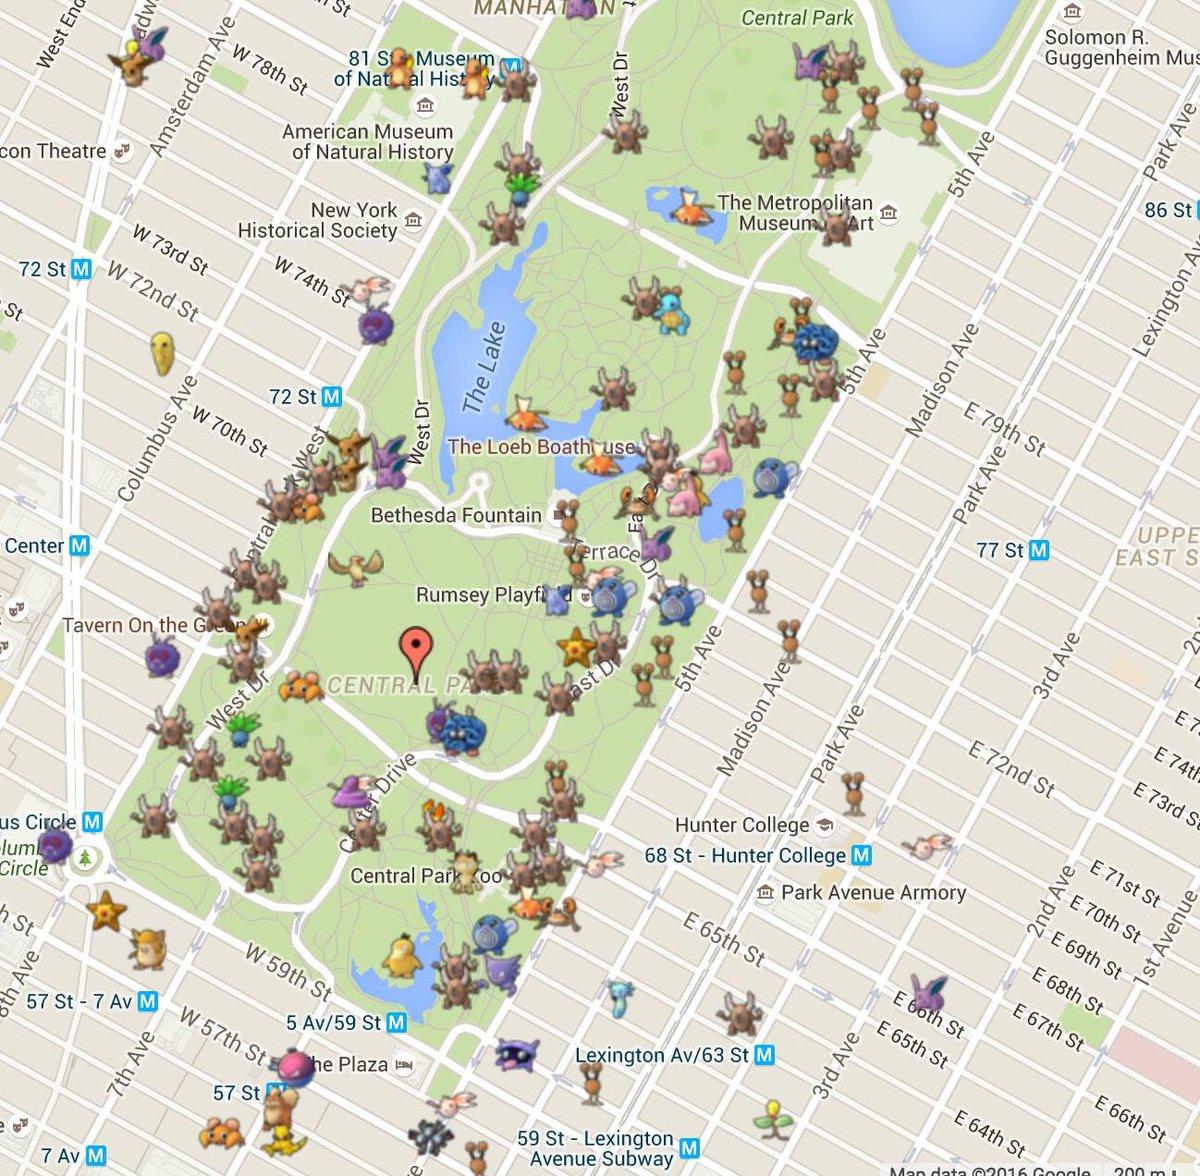 Pokemon Go Nyc Map Pokémon Go Astoria on Twitter: